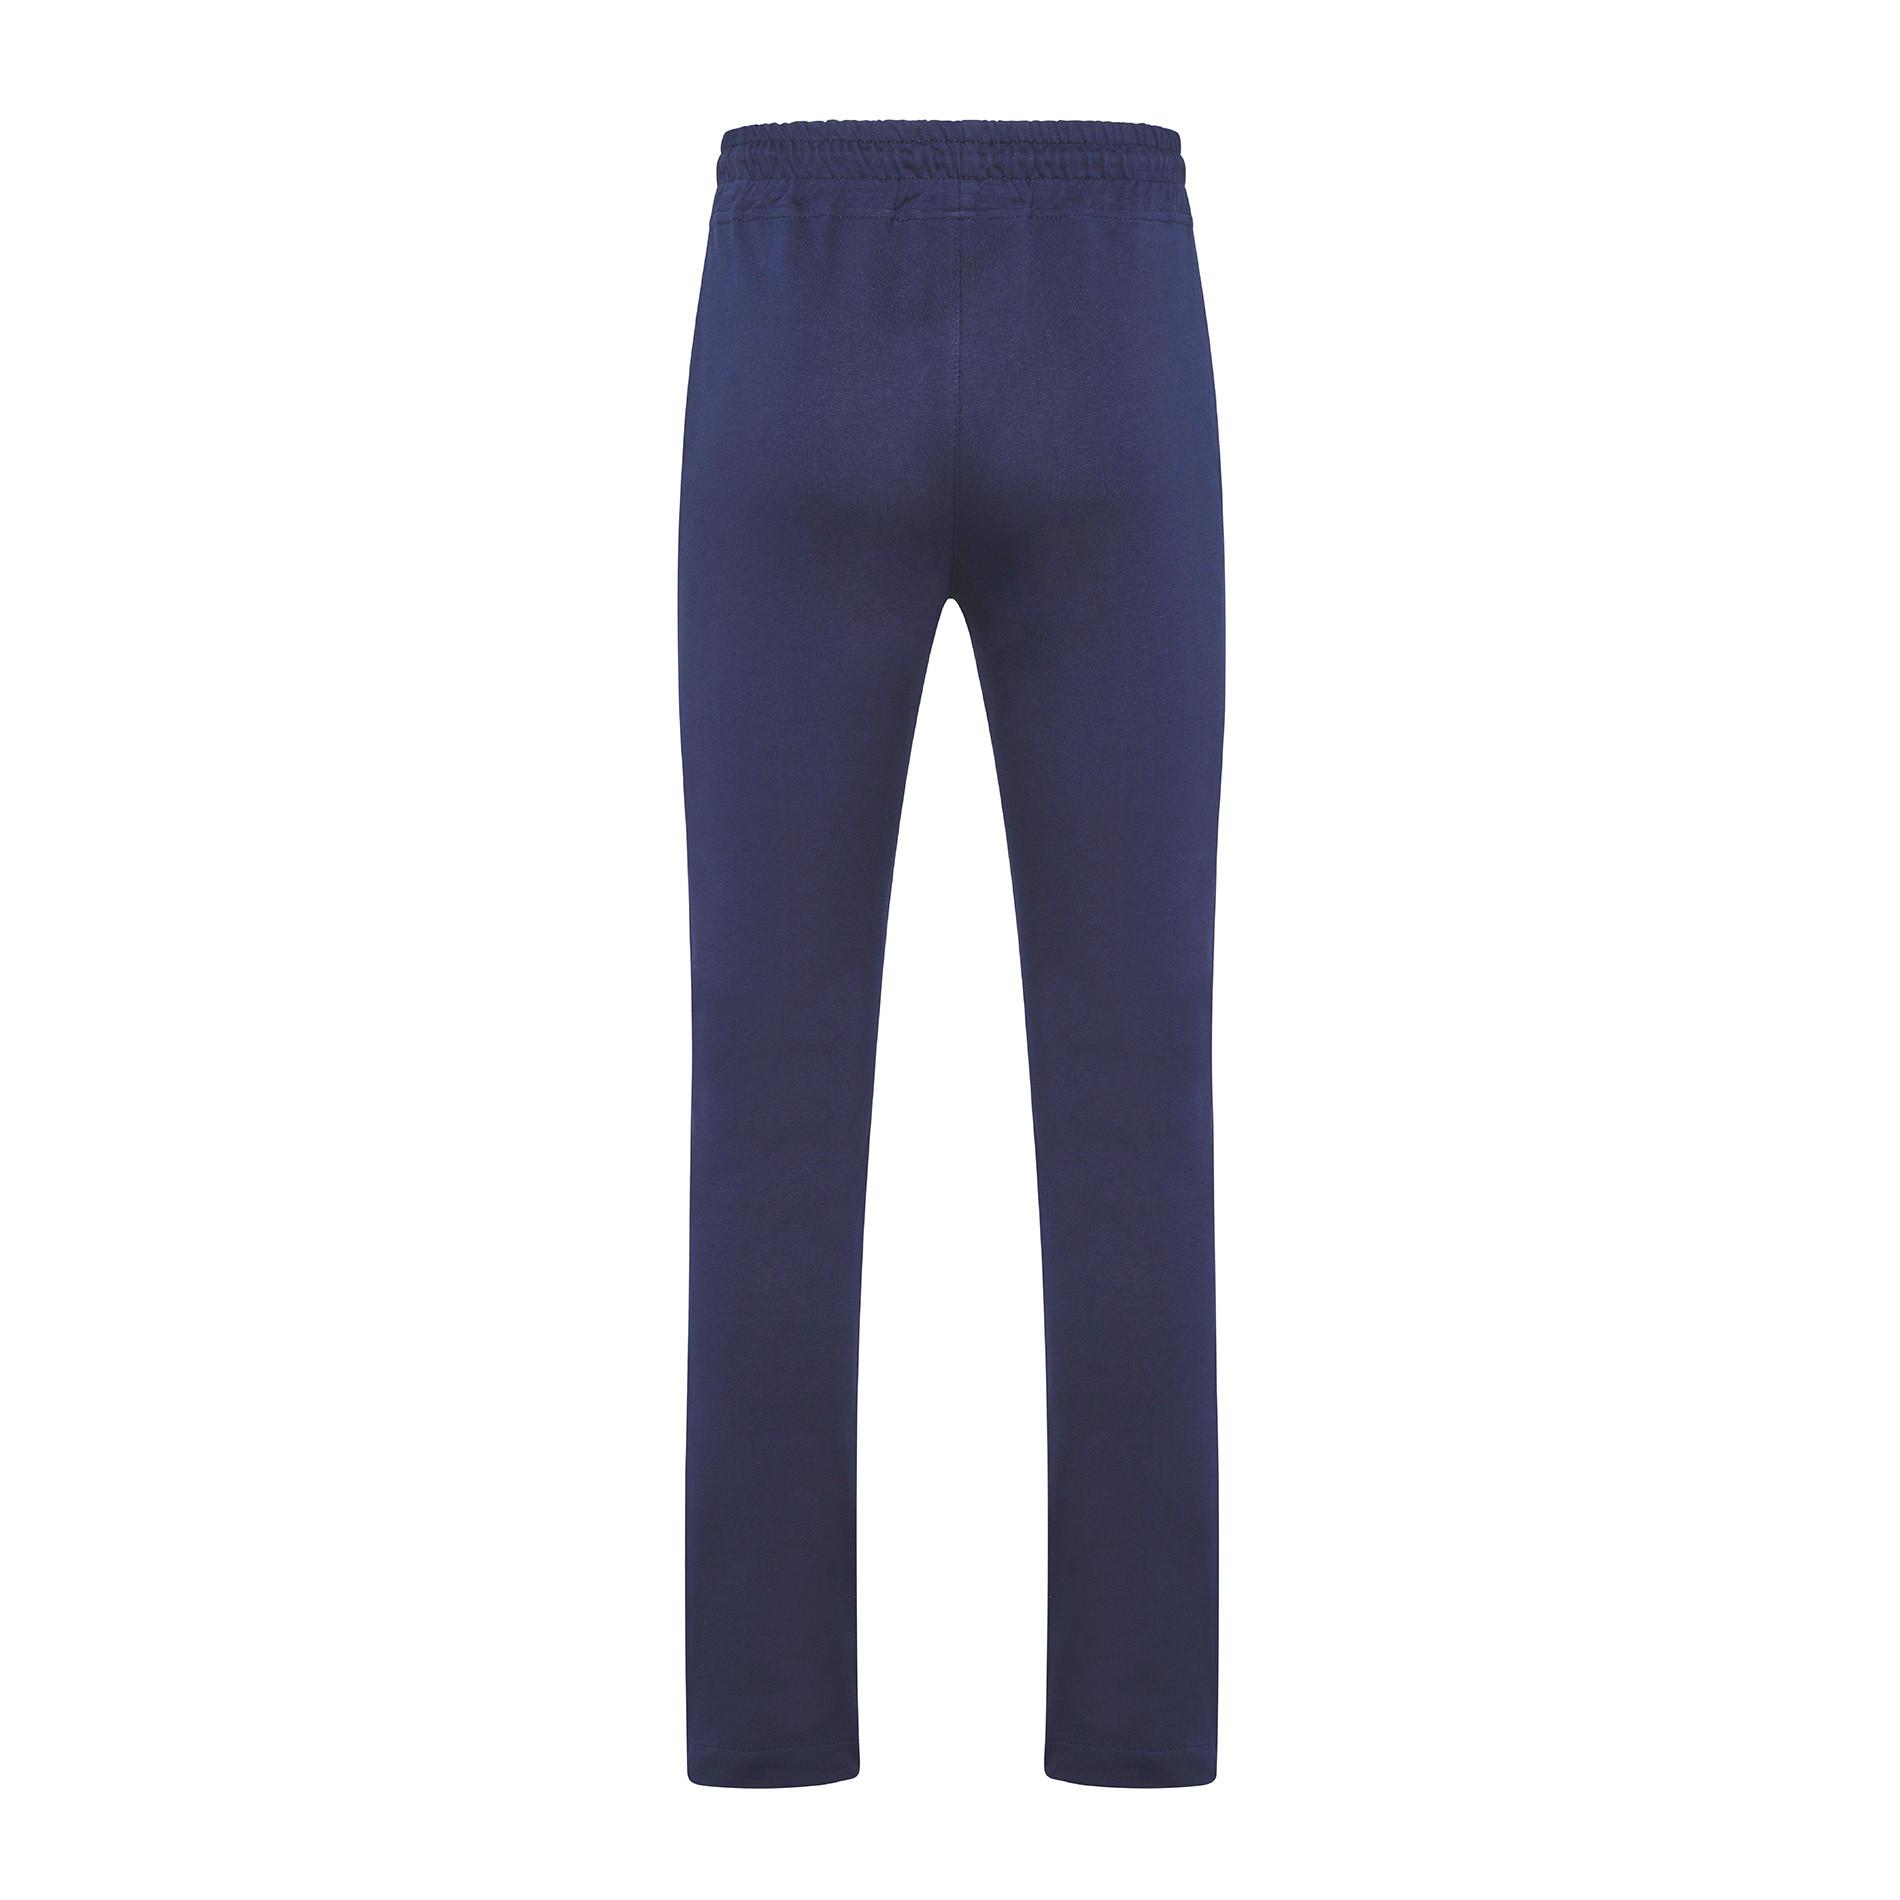 Pantalone felpa di cotone JCT, Blu scuro, large image number 1